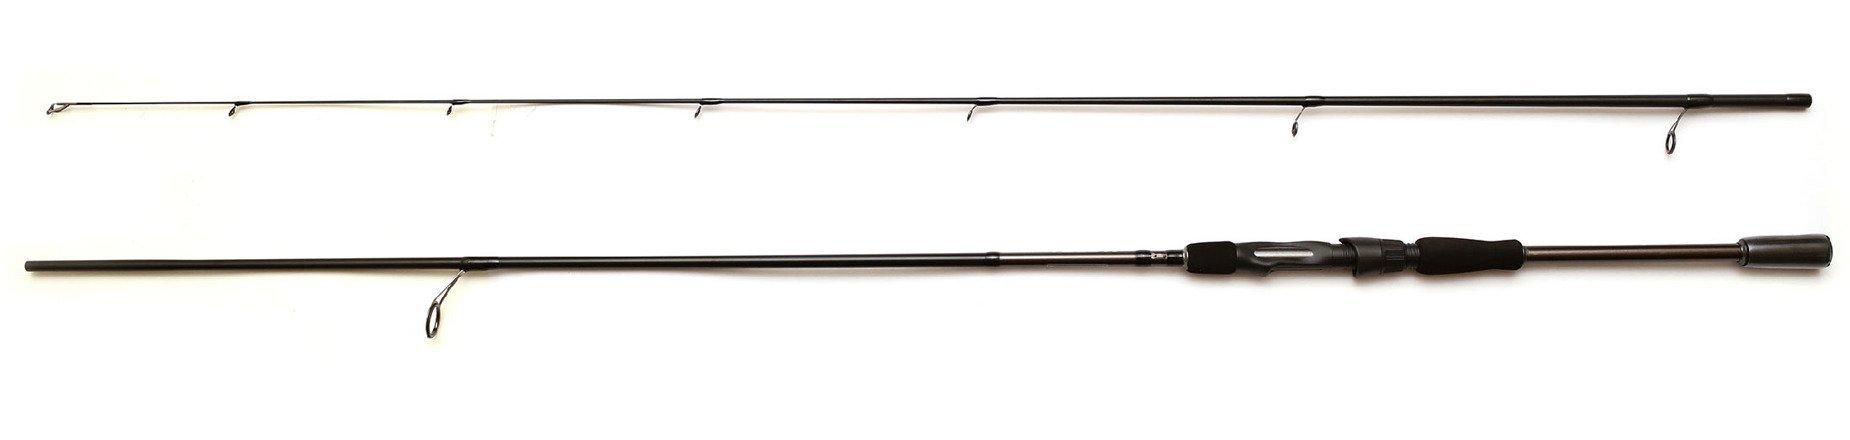 Okuma Altera Spin 270cm 15-40g